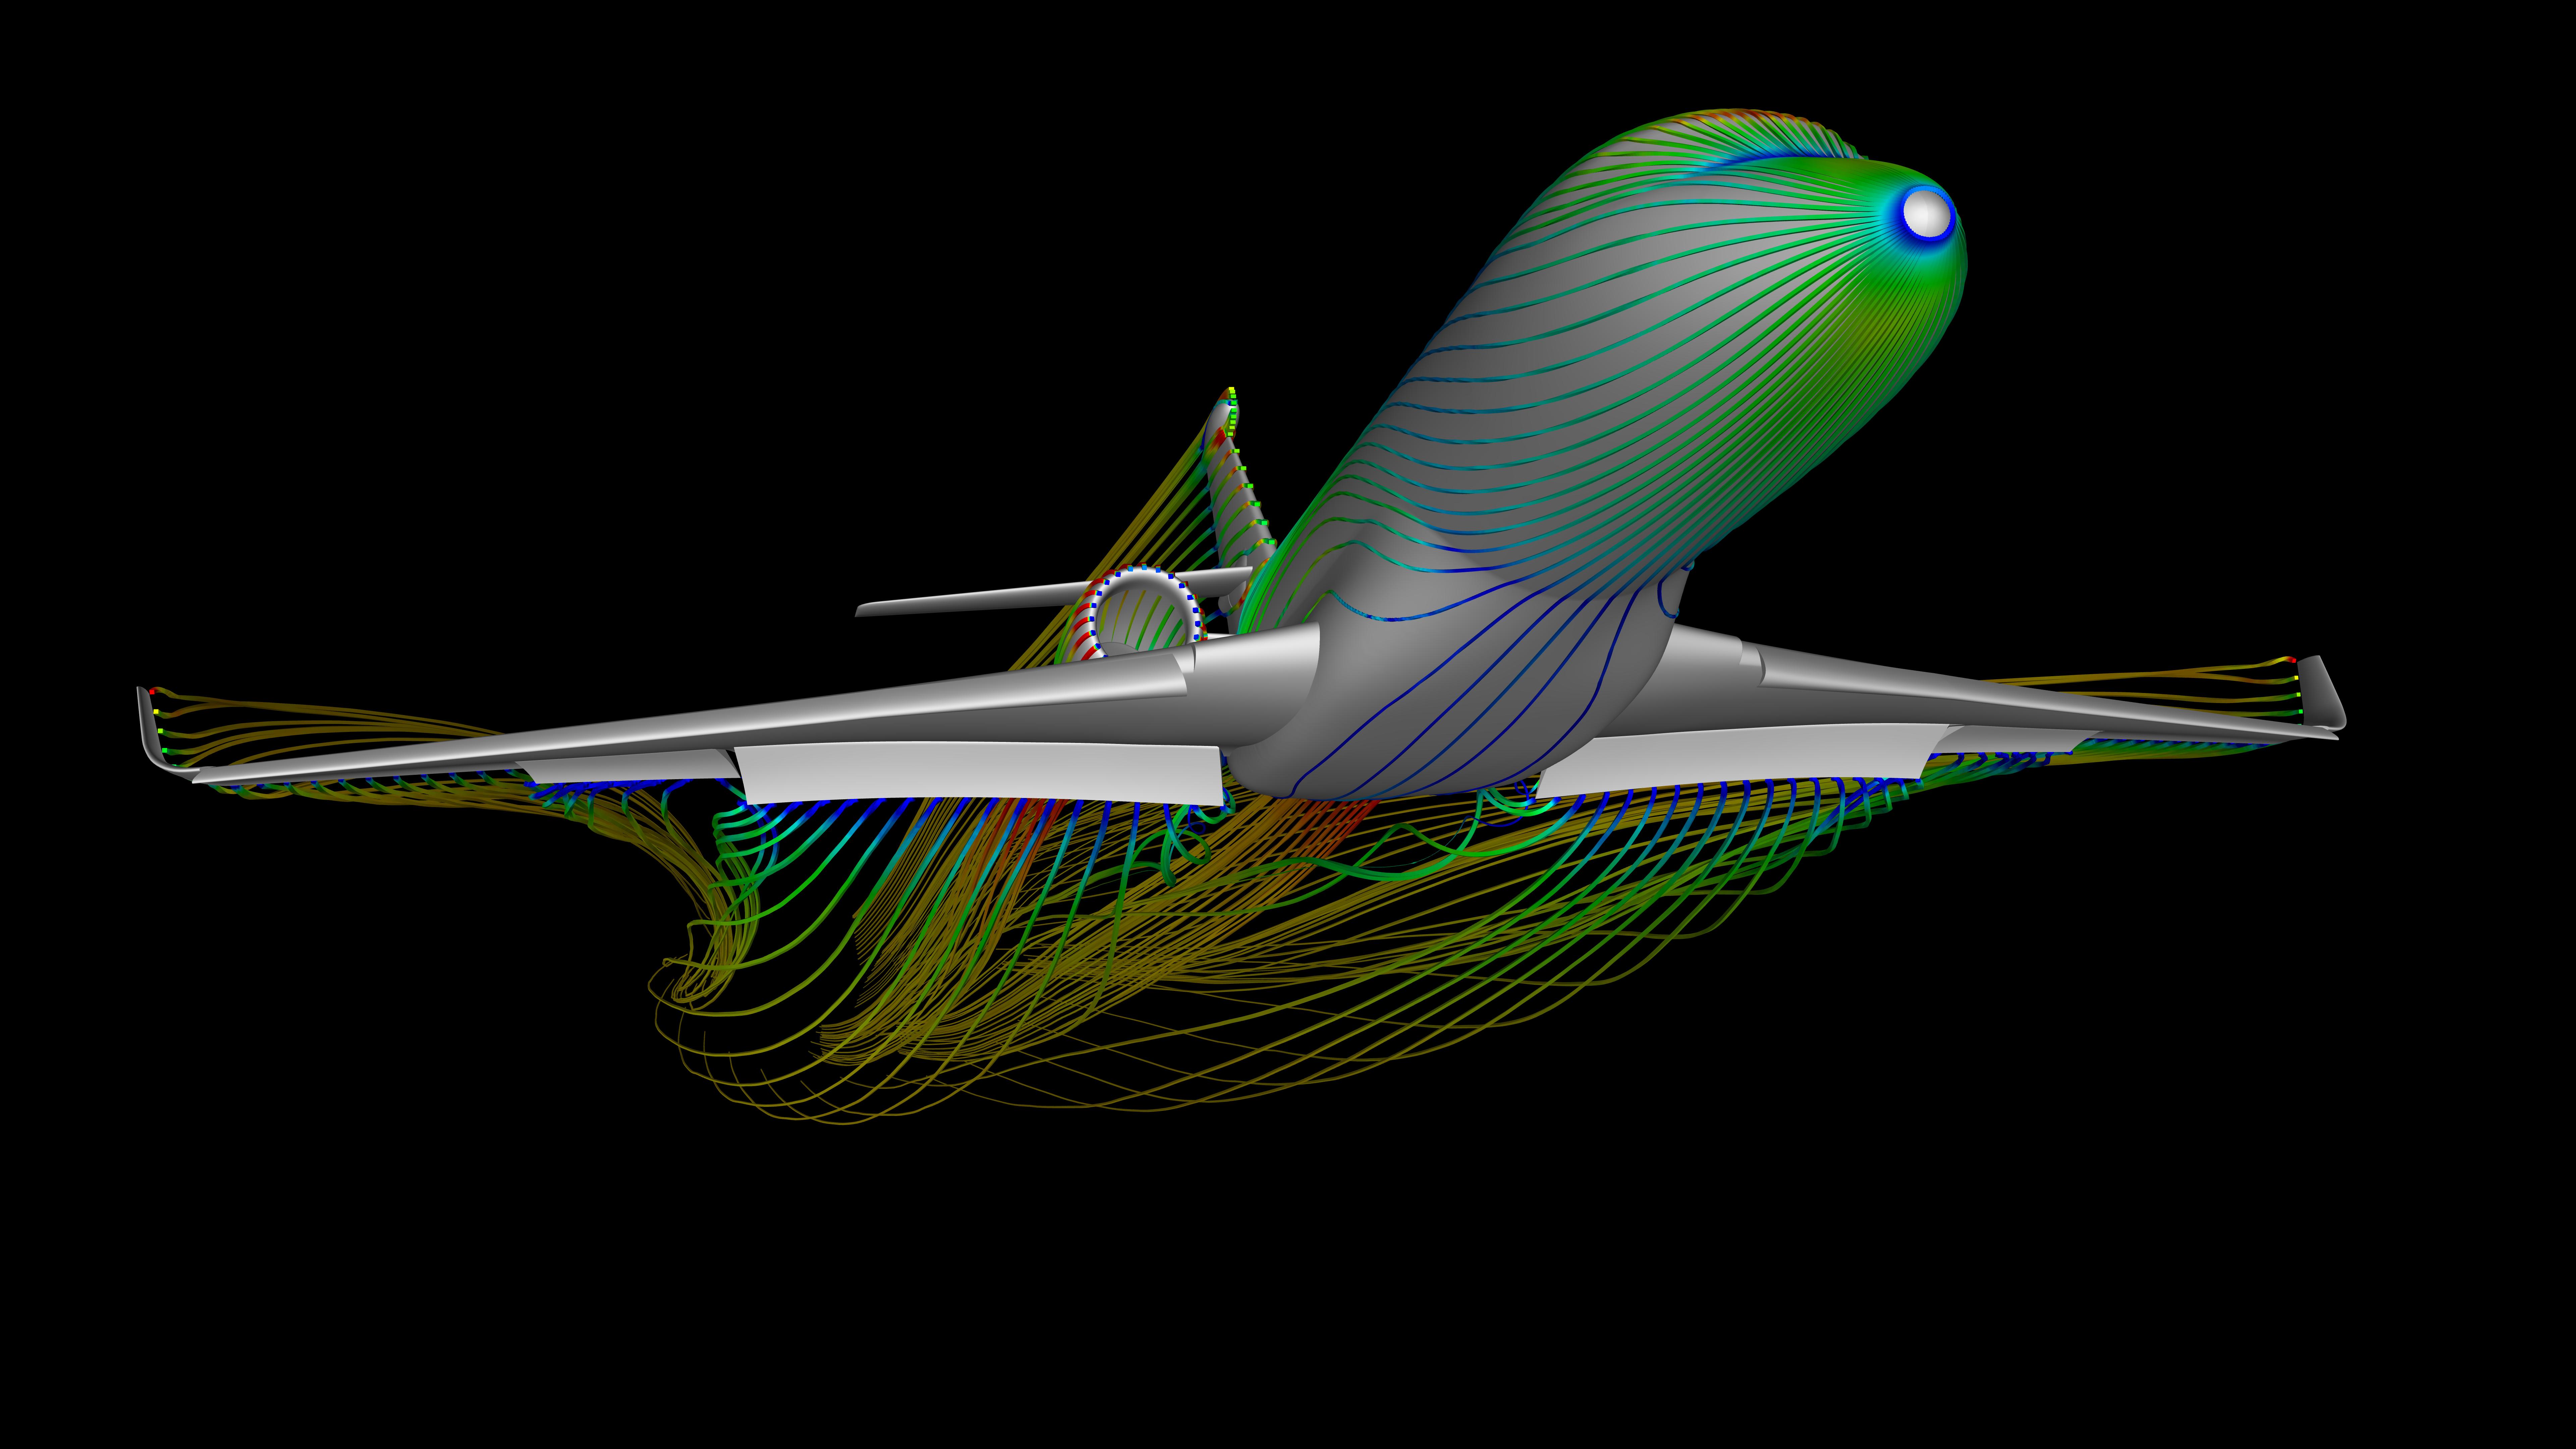 Dassault Falcon 5X - Page 2 048_Falcon5X_2013USB42-c-dassault-aviation